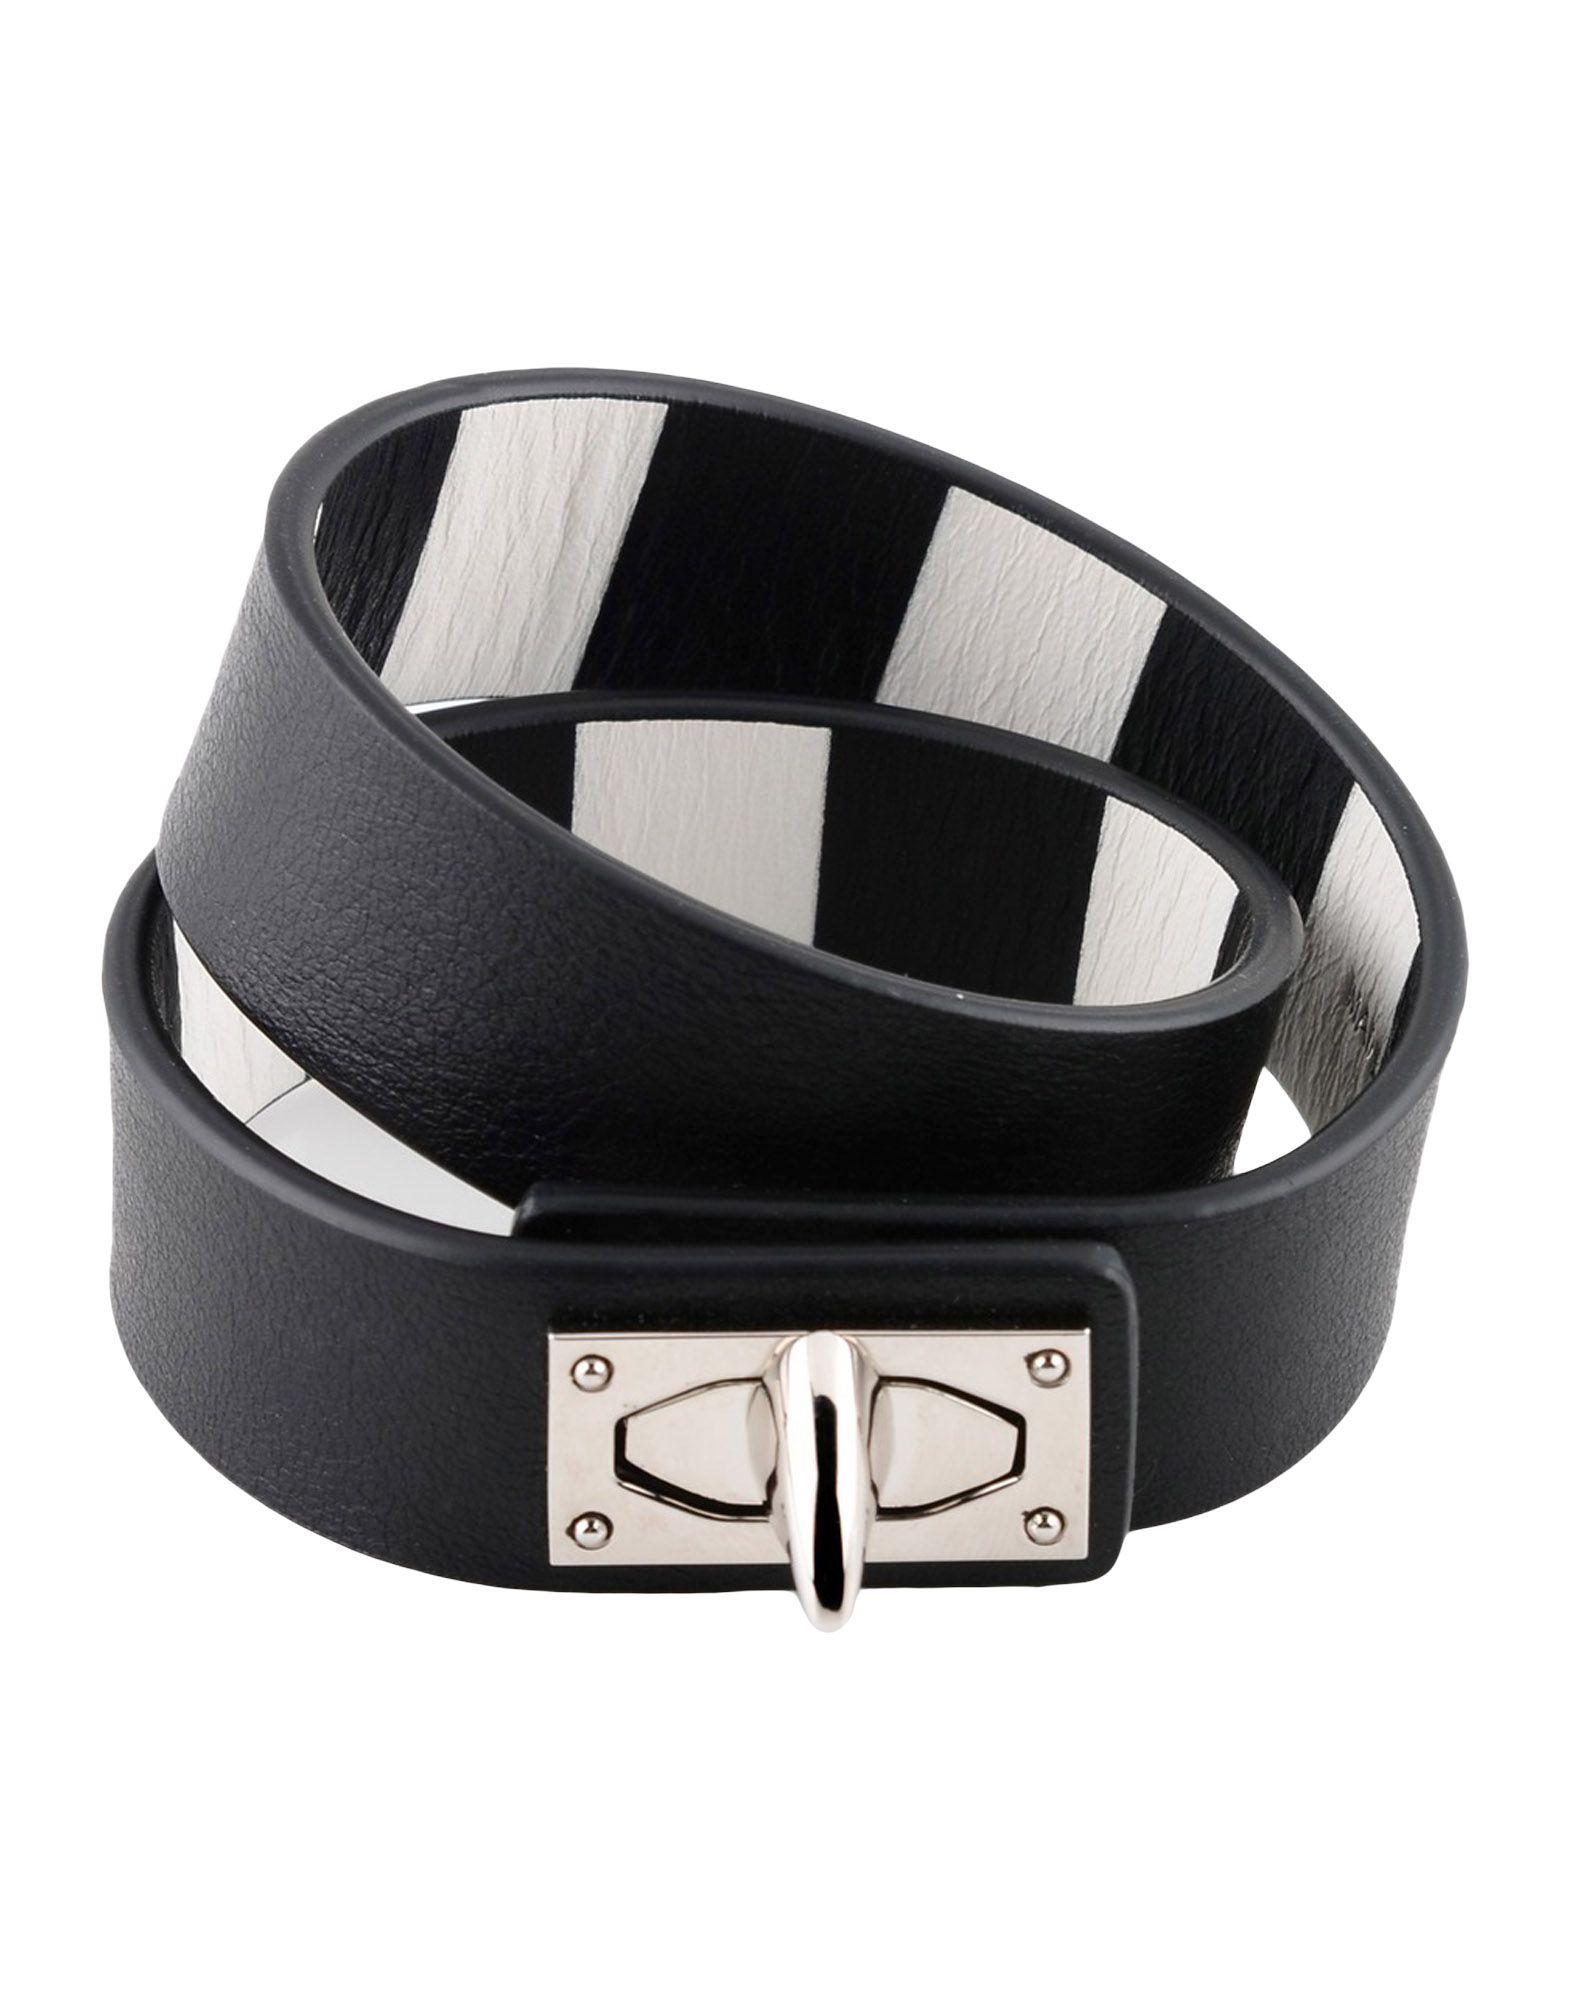 Bracciale Givenchy Donna - Acquista online su